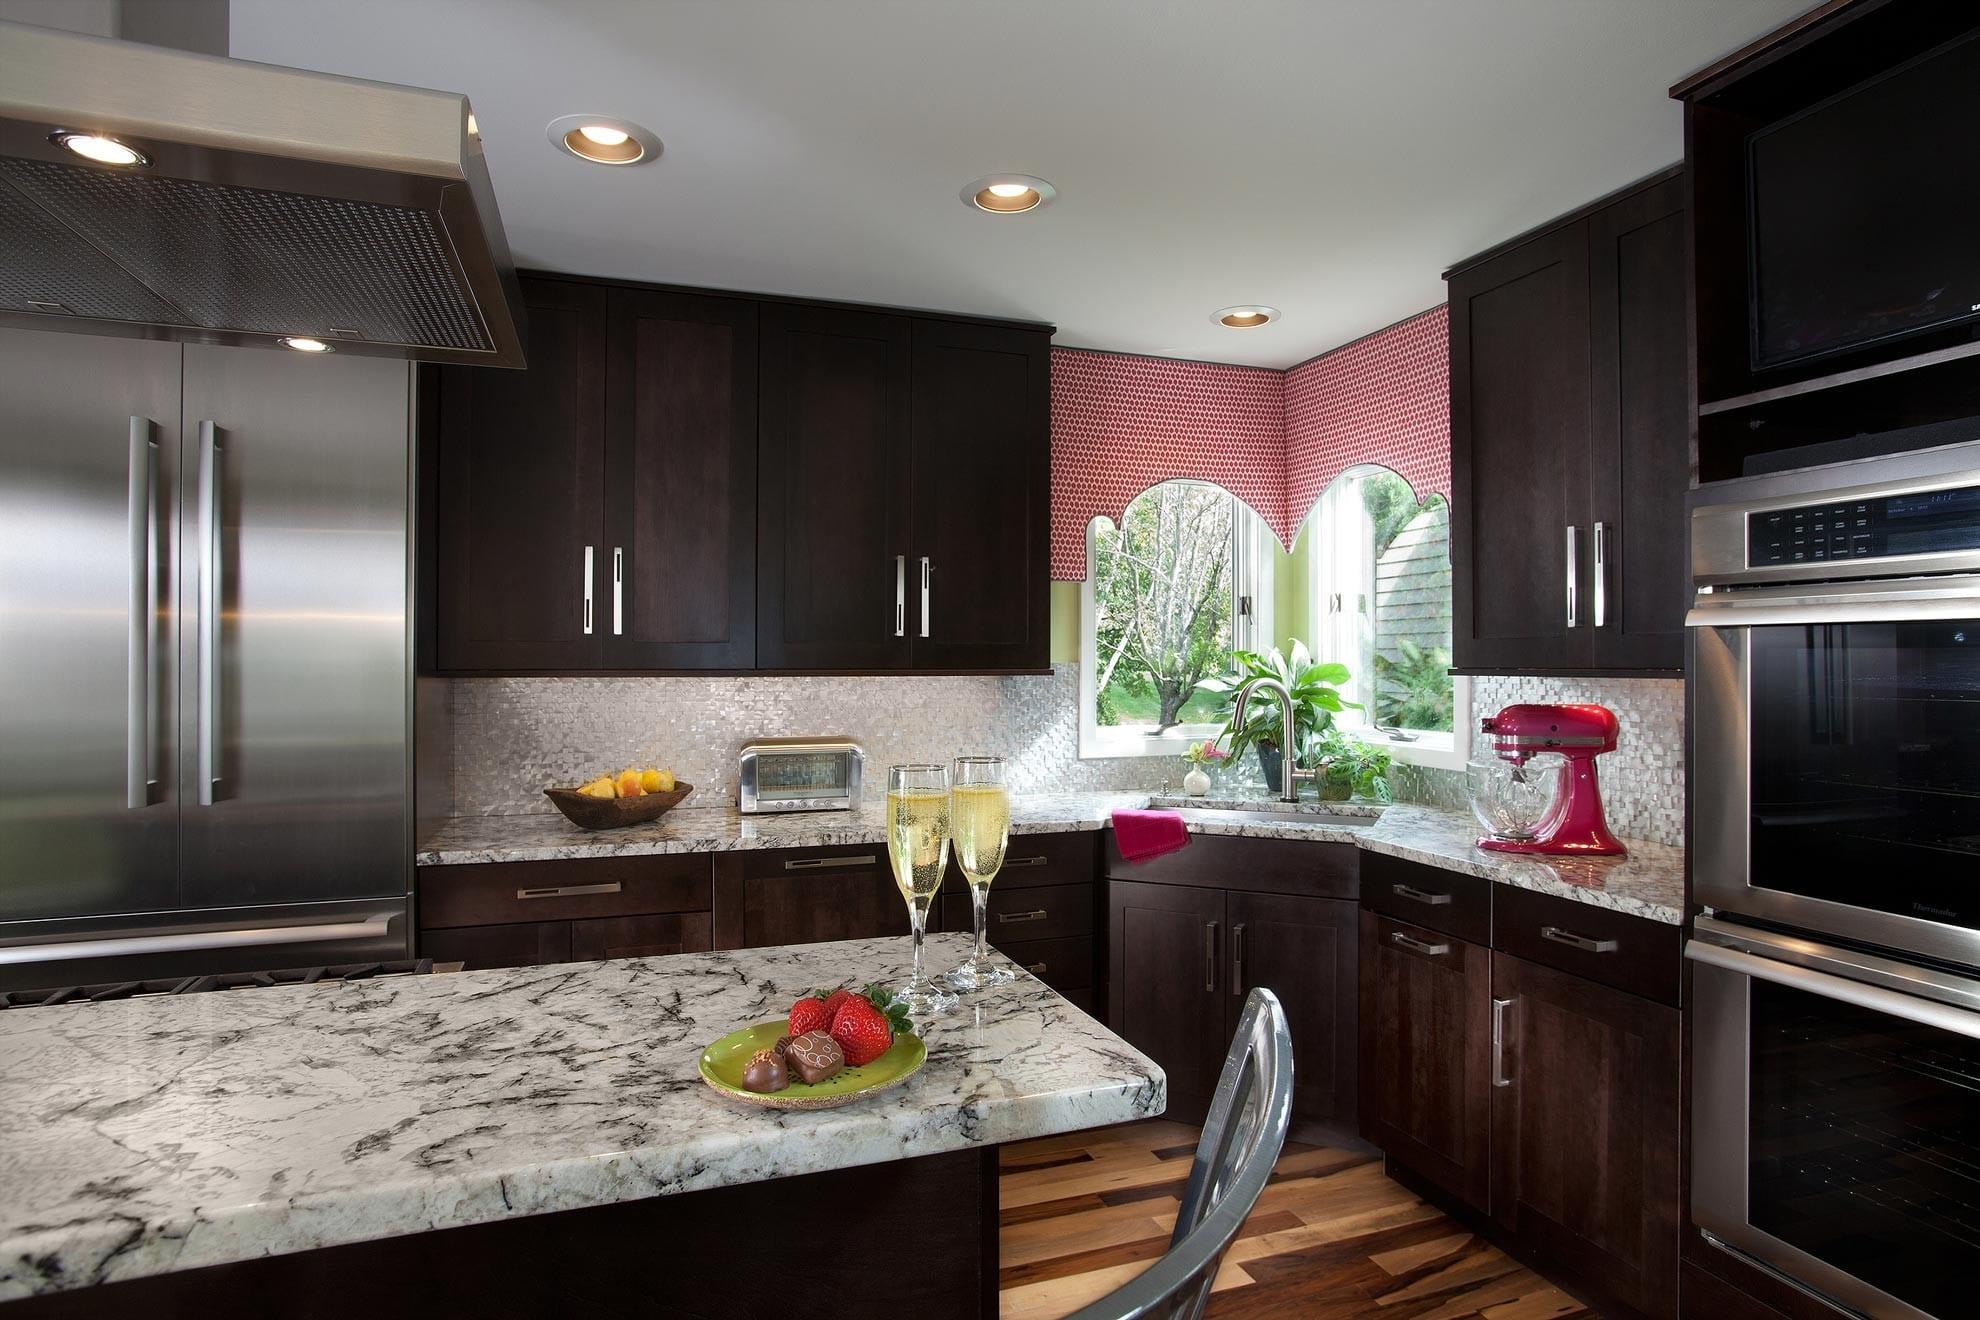 harrisburg pa contemporary kitchen renovation kitchen remodeling york pa Harrisburg PA Contemporary Kitchen Remodel Mother Hubbards Custom Cabinetry